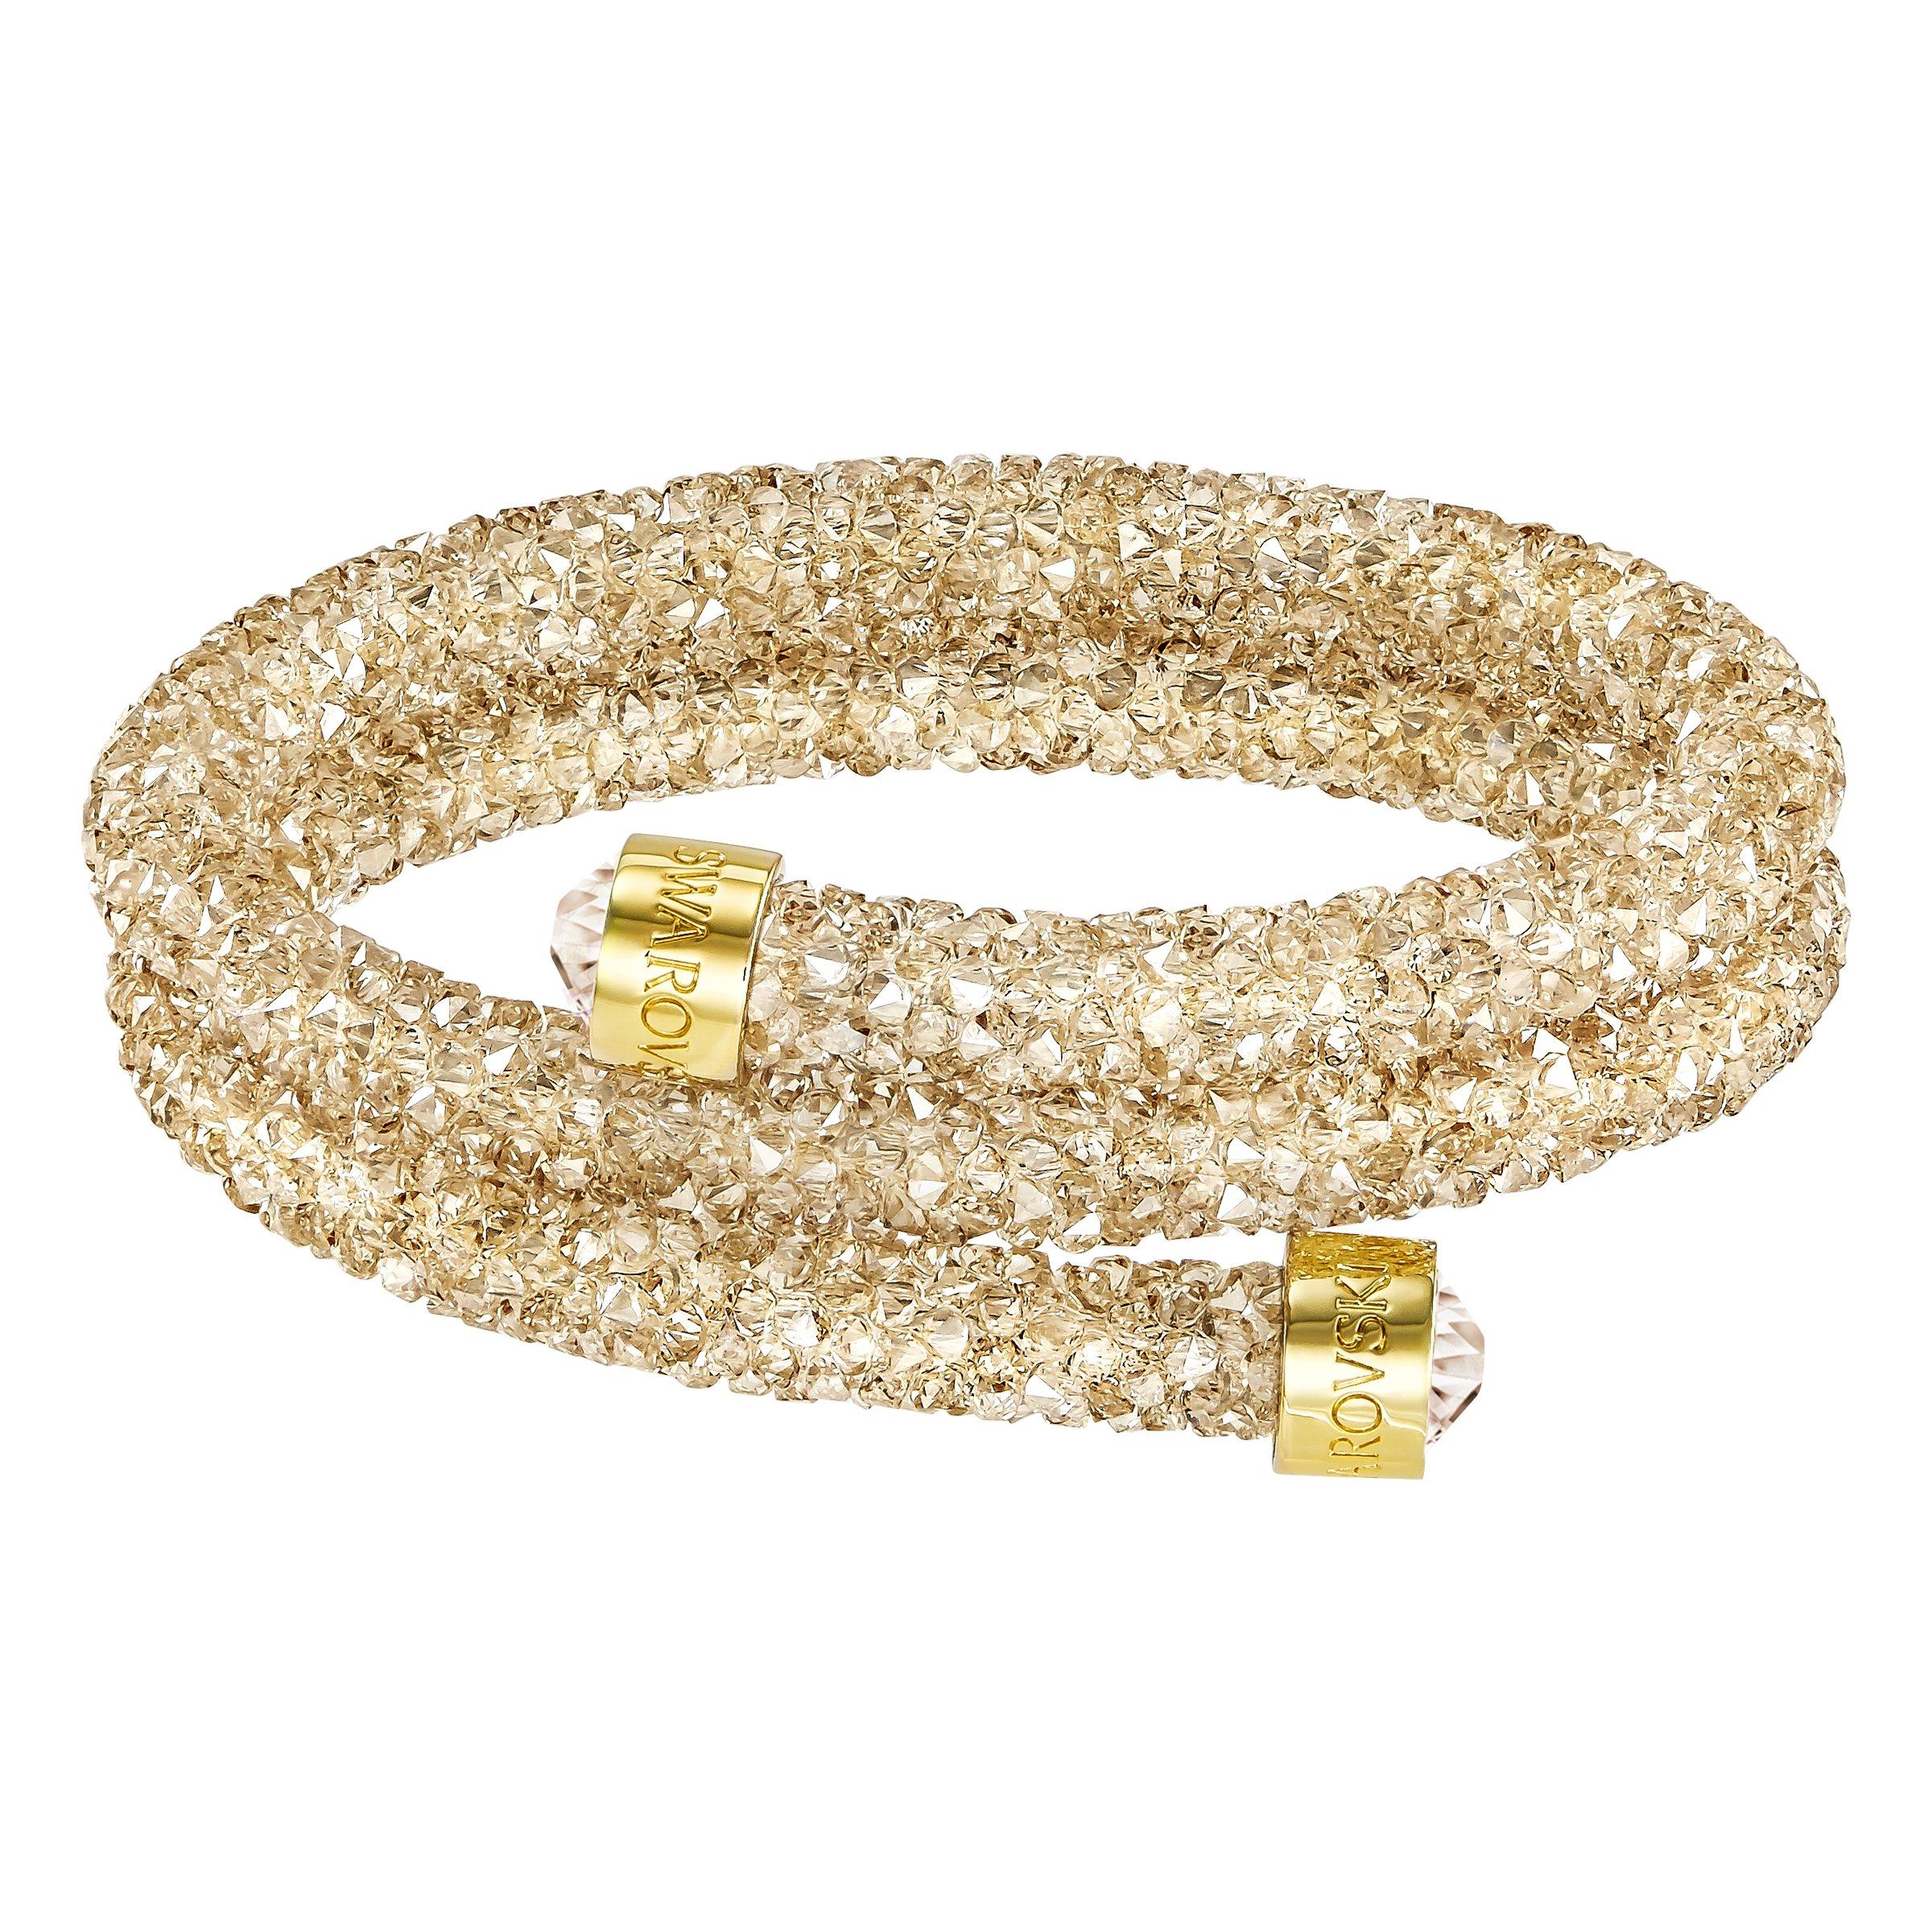 Swarovski Crystaldust Double Bangle Bracelet, Golden Crystal - Small